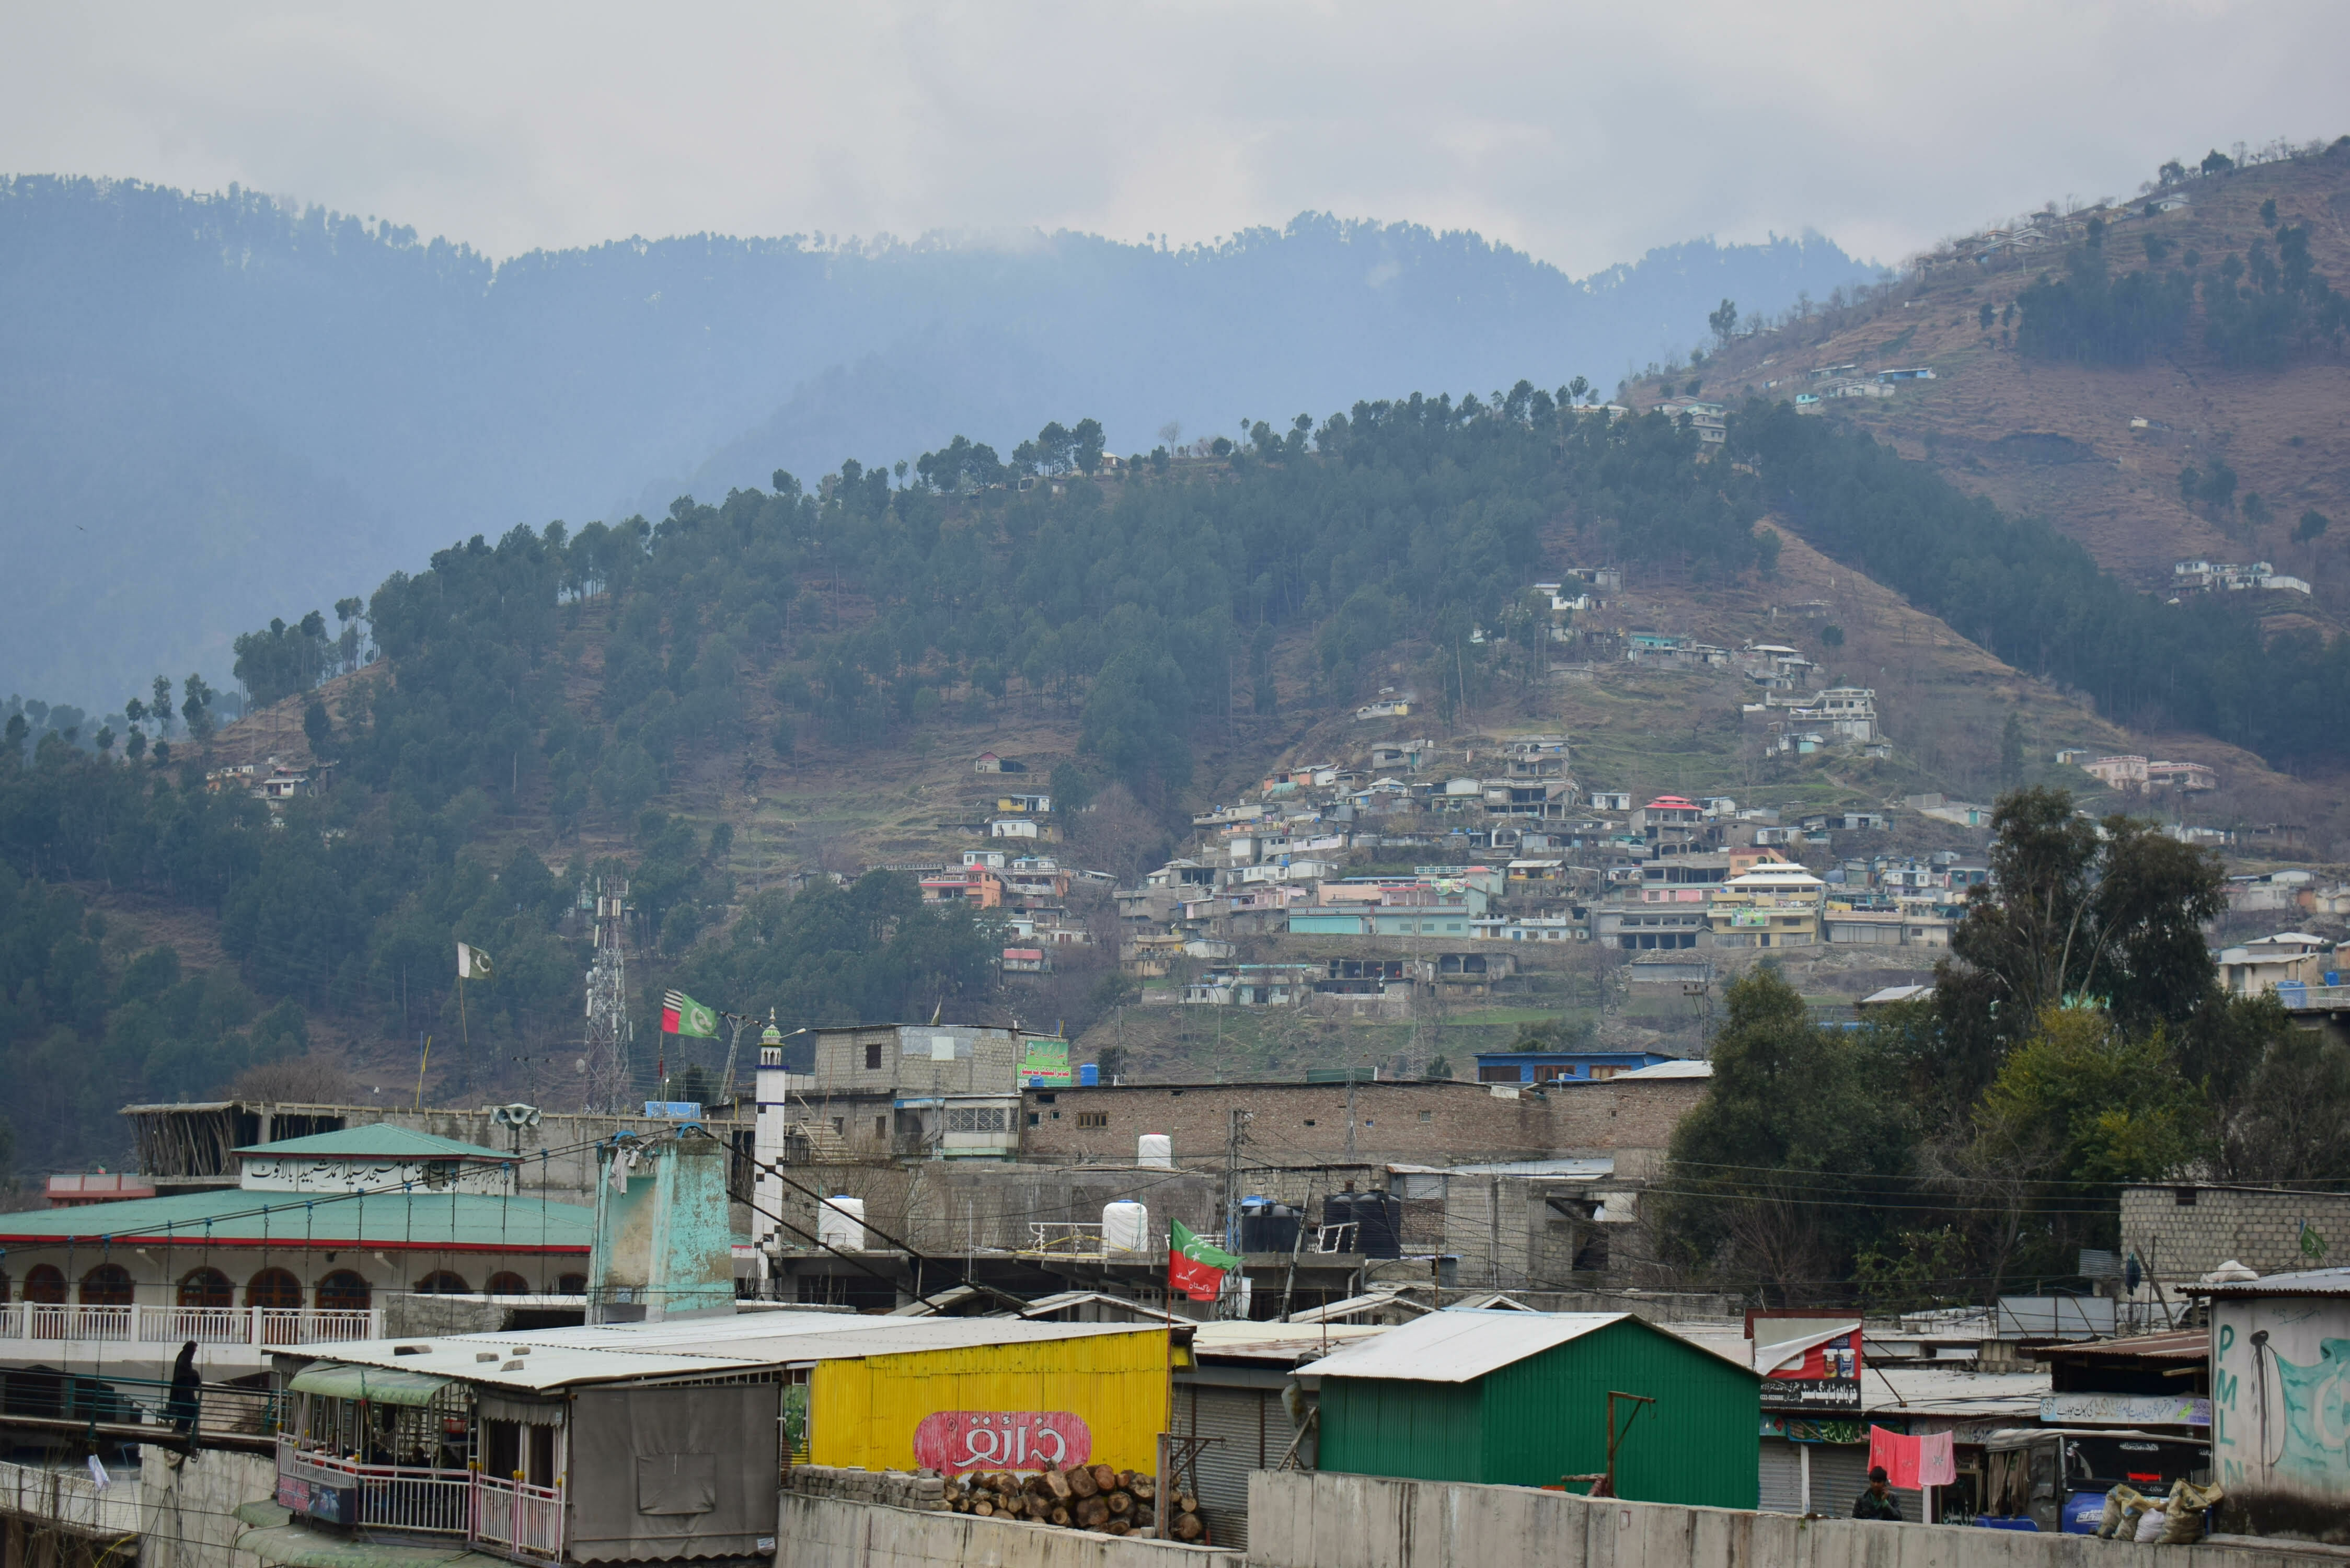 Balakot's fate: Not a destination, but now in the news